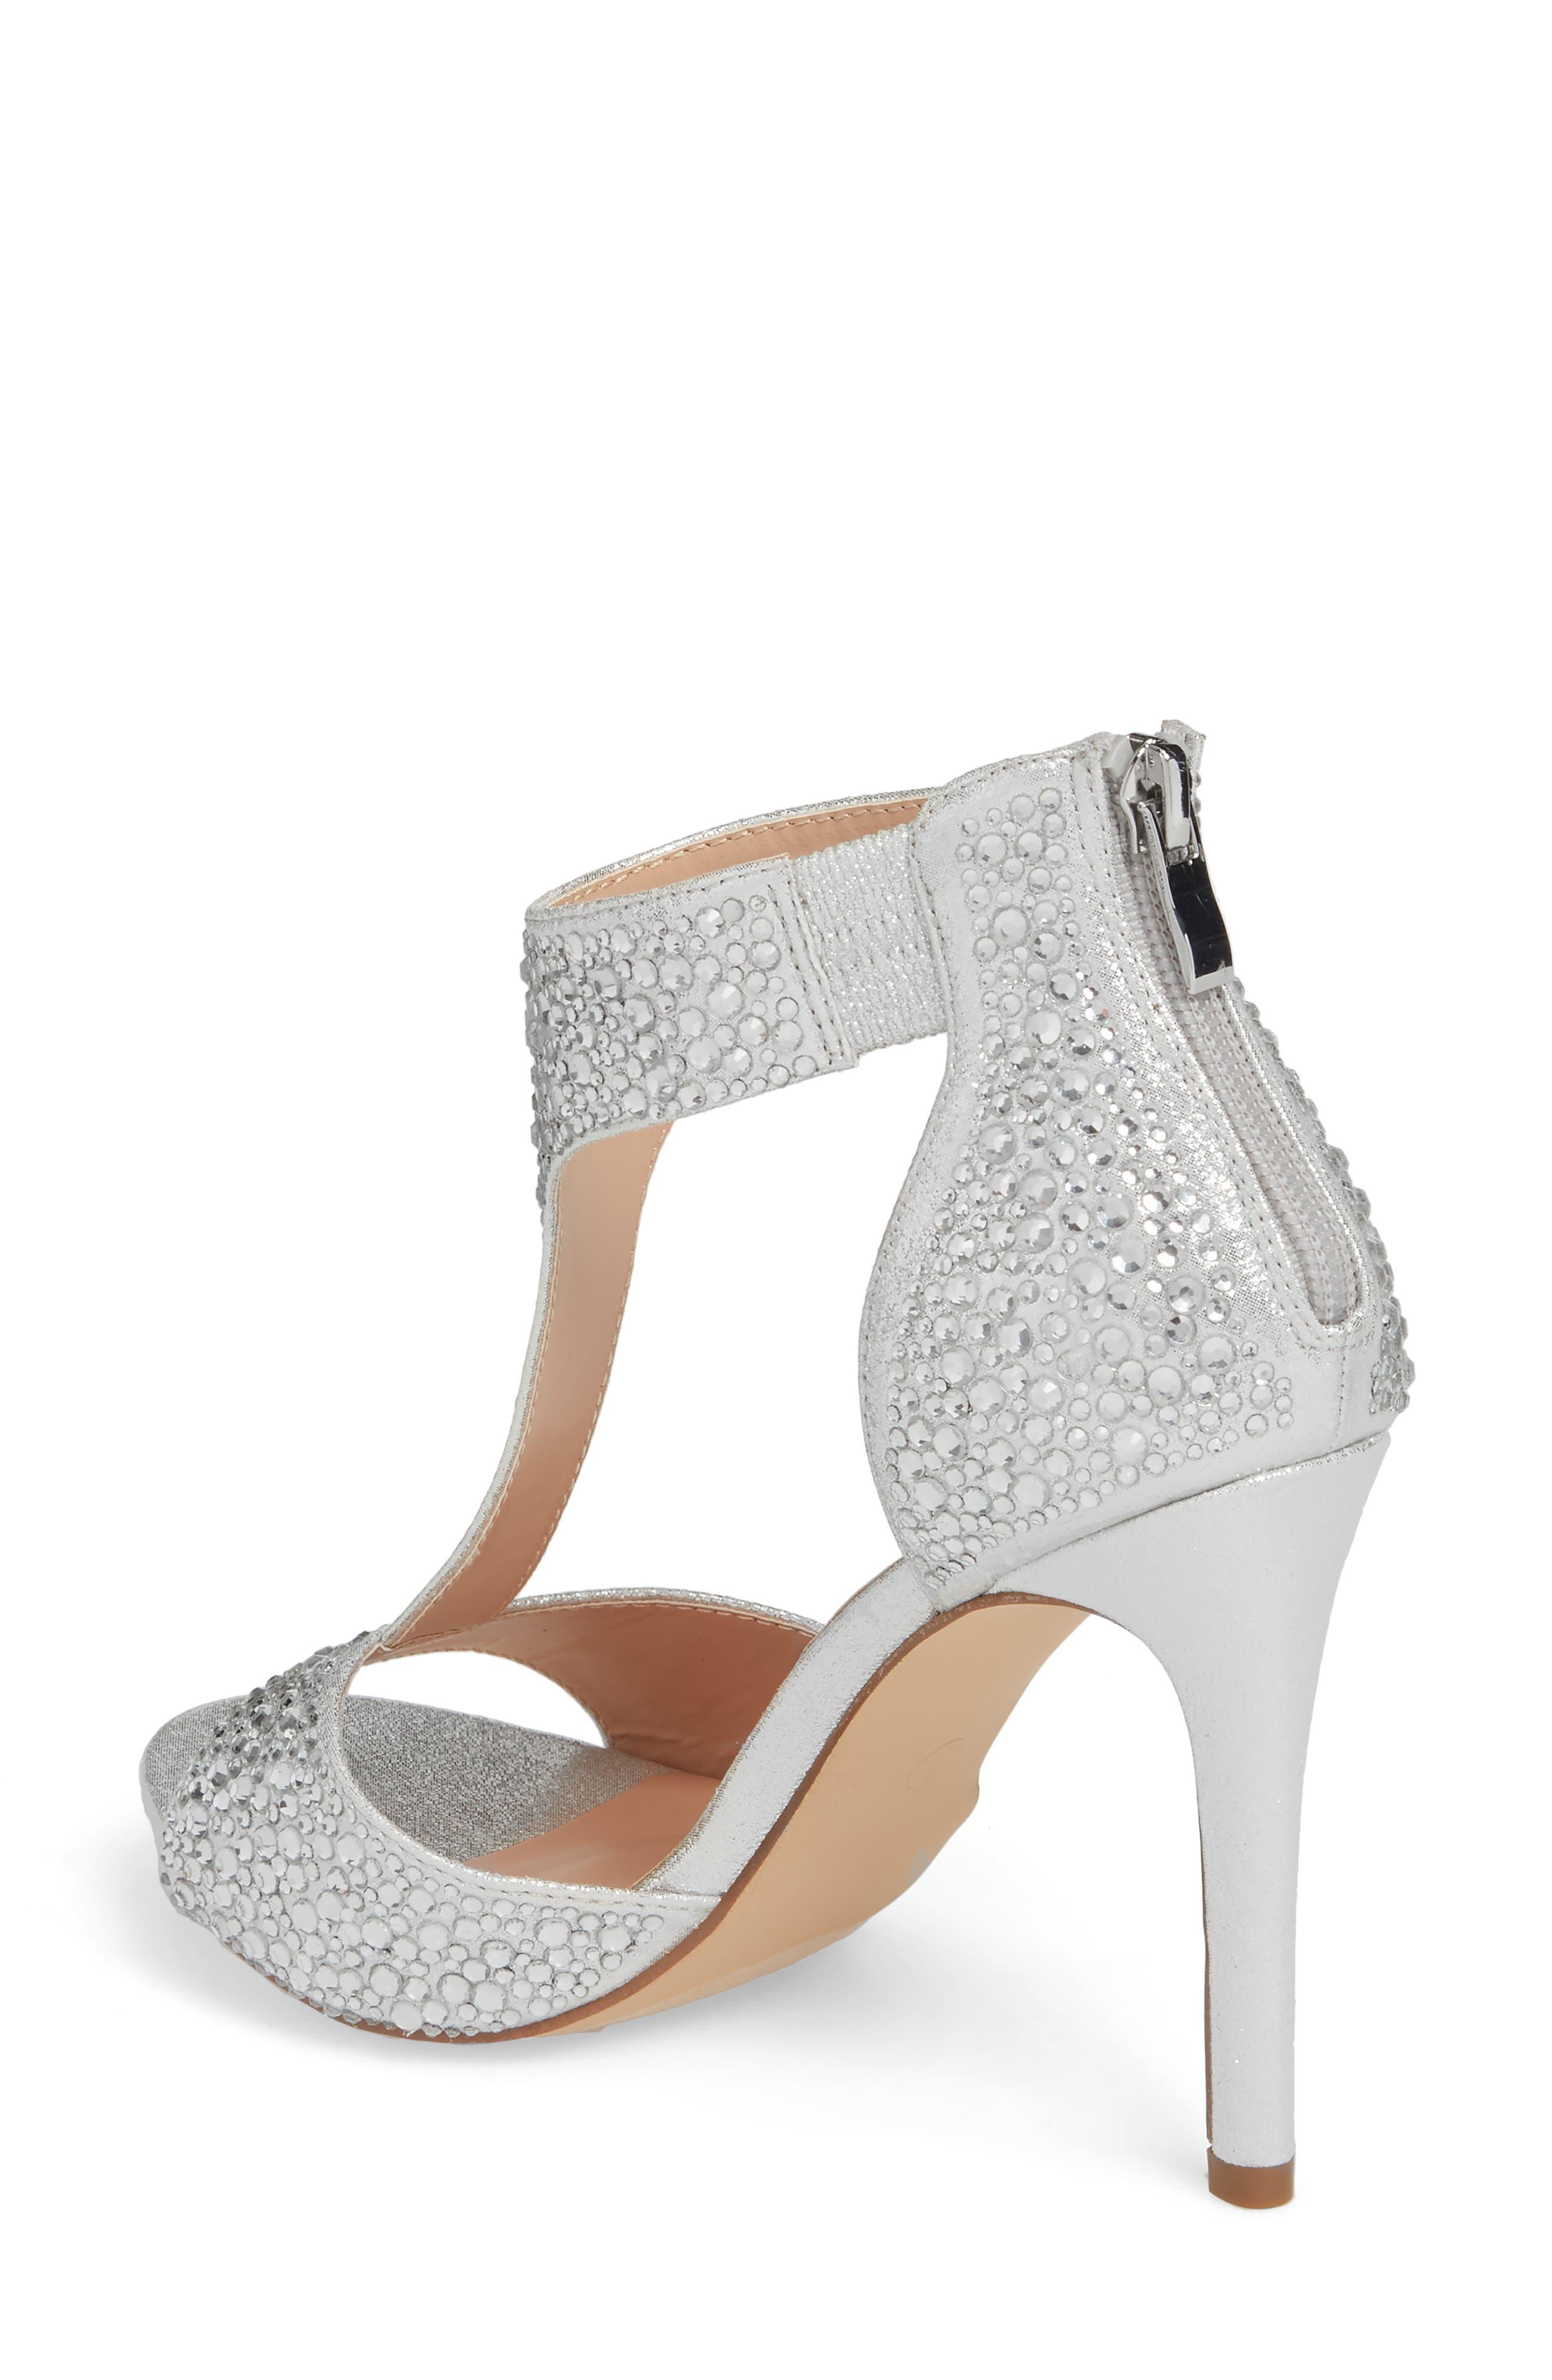 Ina Crystal Embellished Sandal,                             Alternate thumbnail 2, color,                             Silver